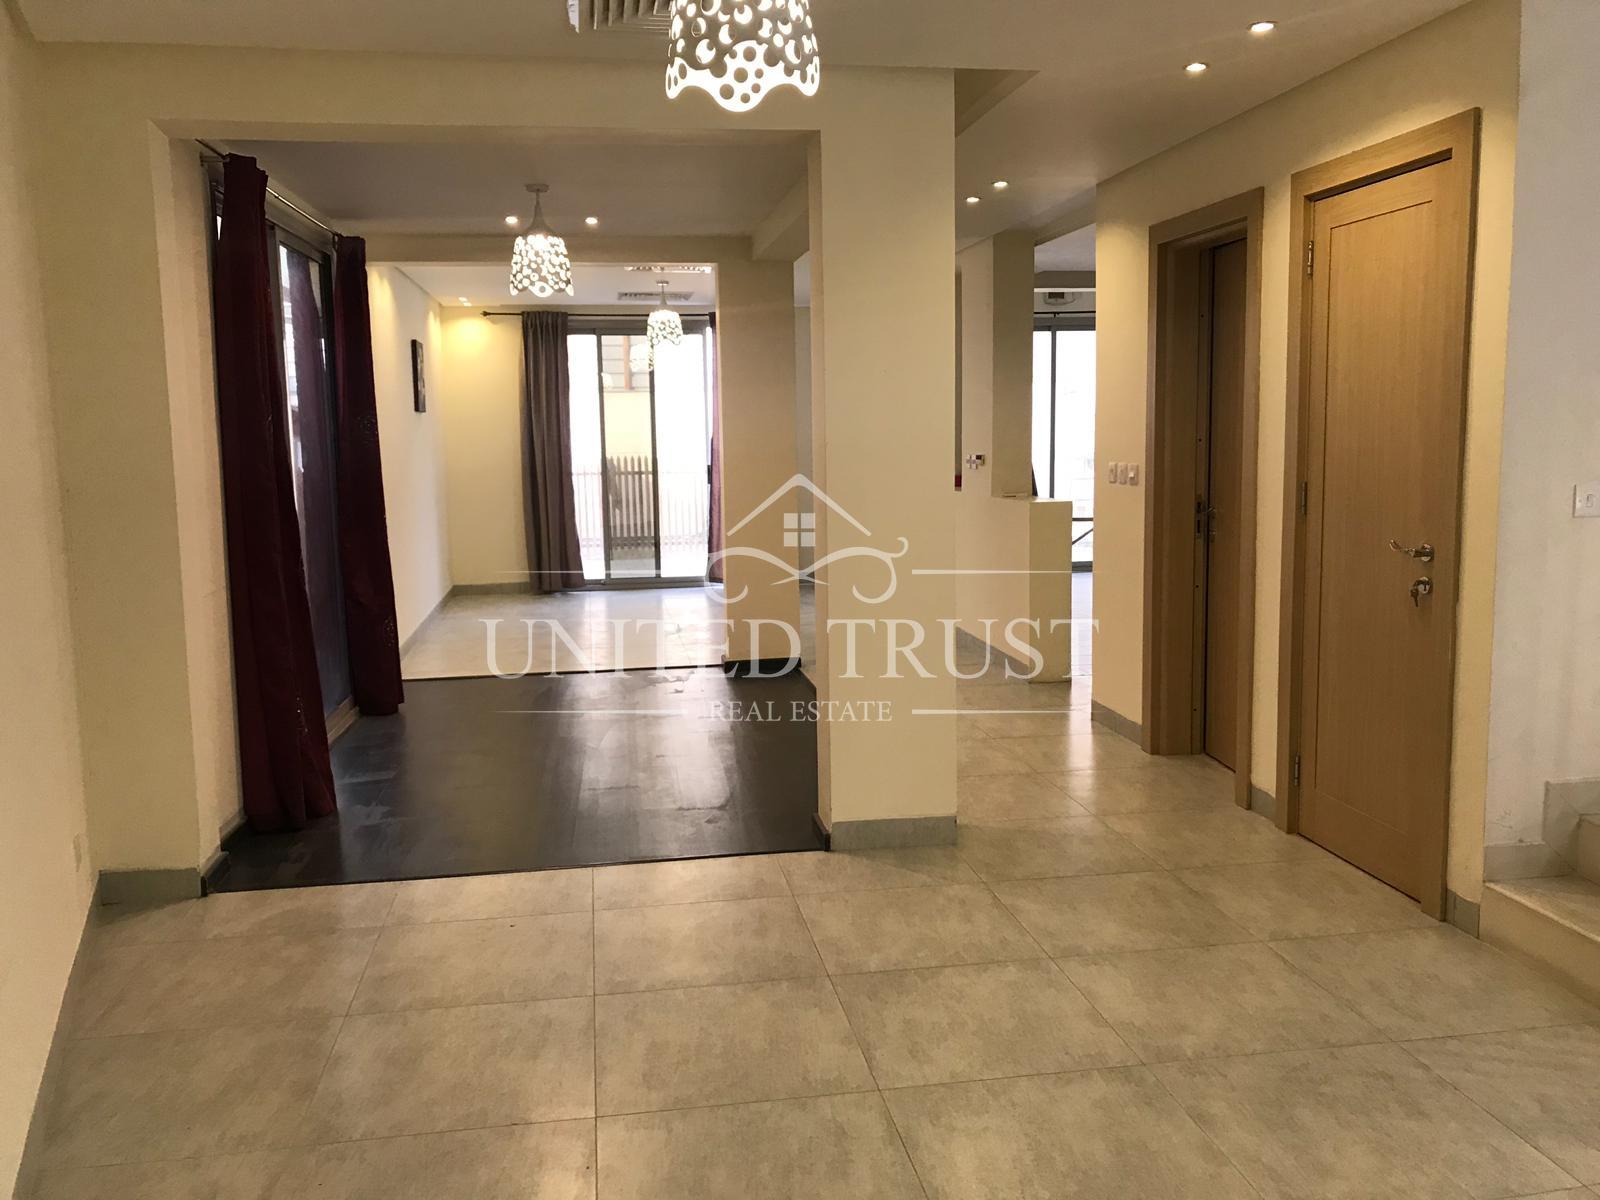 For Rent a villa Saraya 2 Ref: SAR2-AZ-005